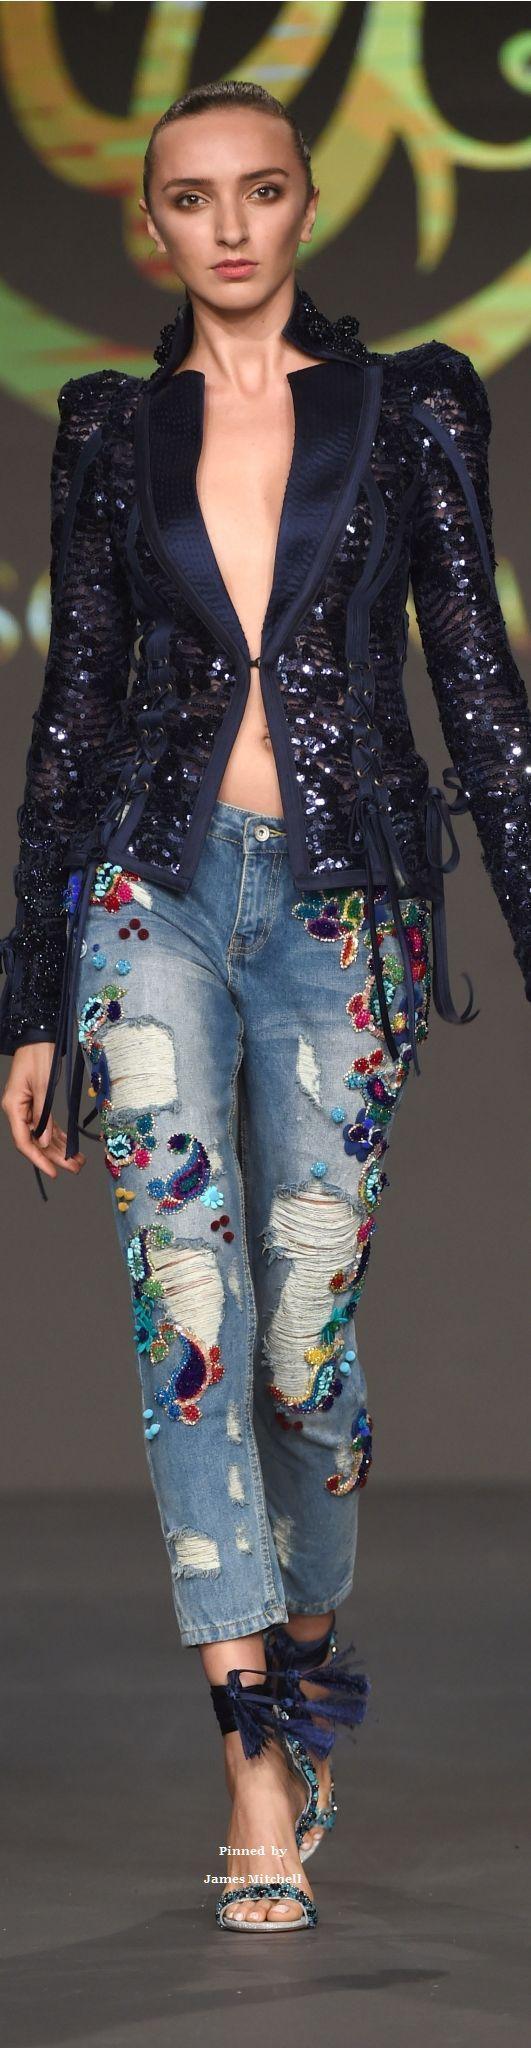 Soltana Fashion Forward Fall 2016 Collection